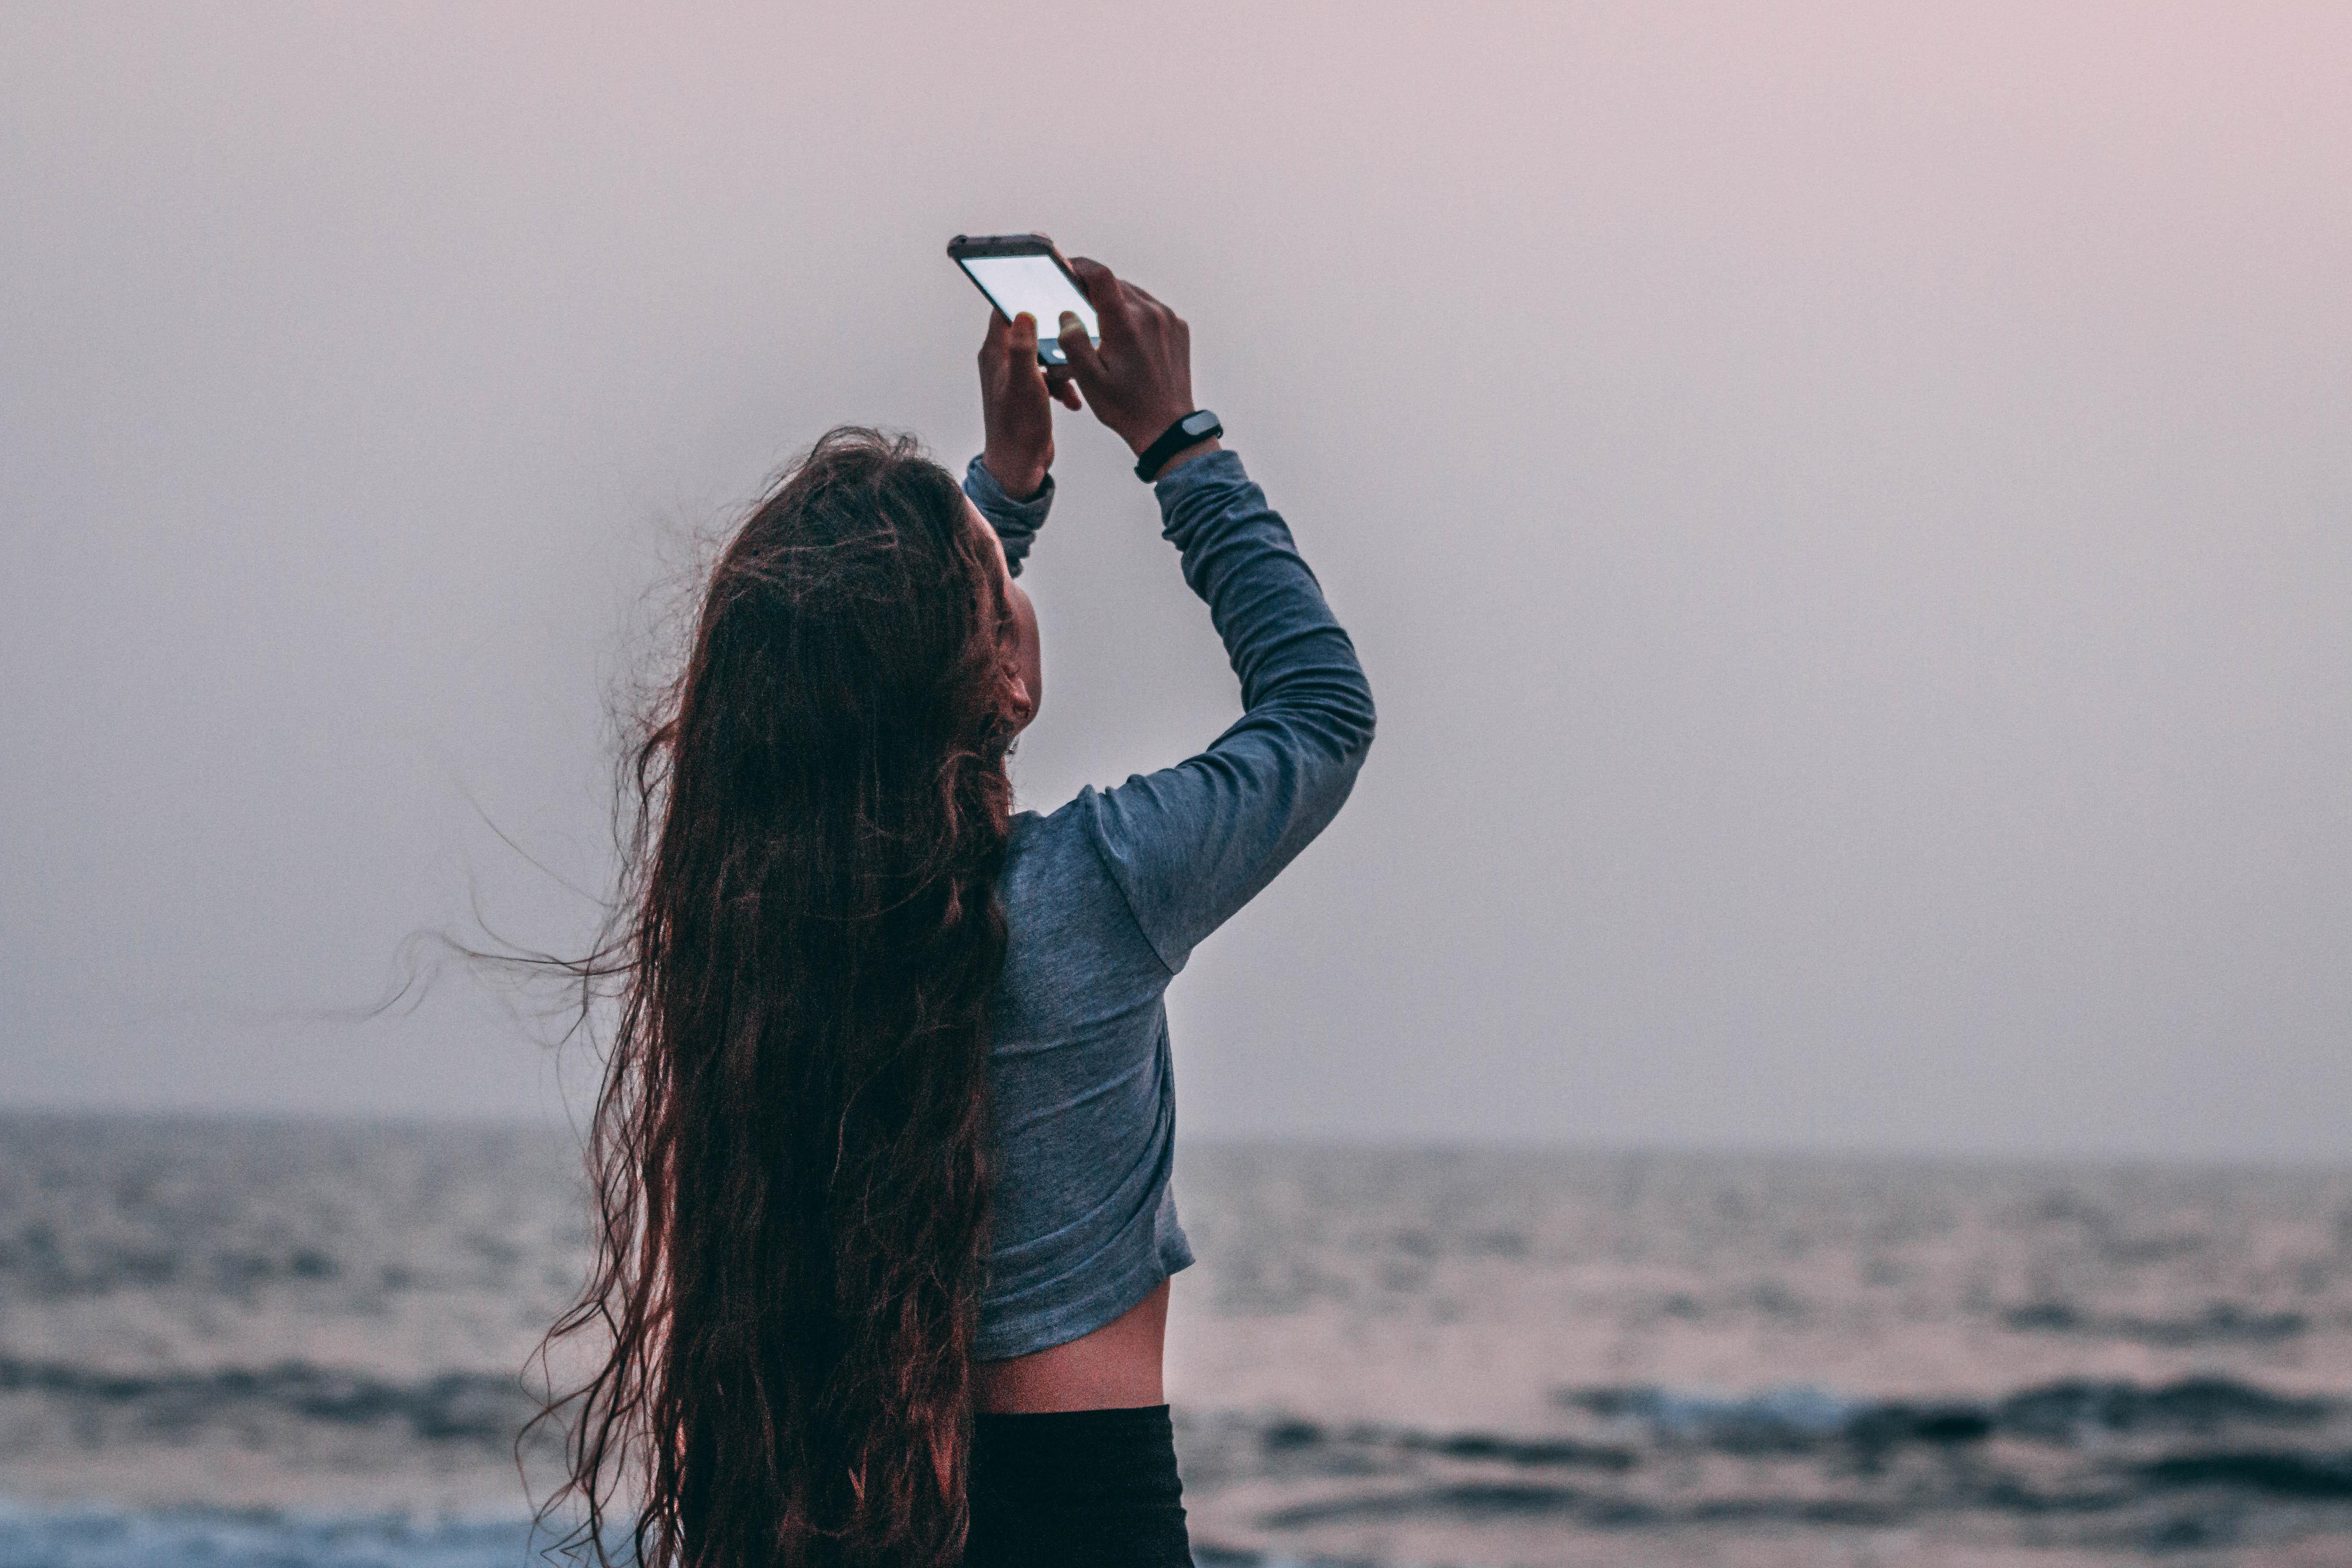 Women's Gray Long-sleeved Shirt, Sea, Young, Woman, Wind, HQ Photo